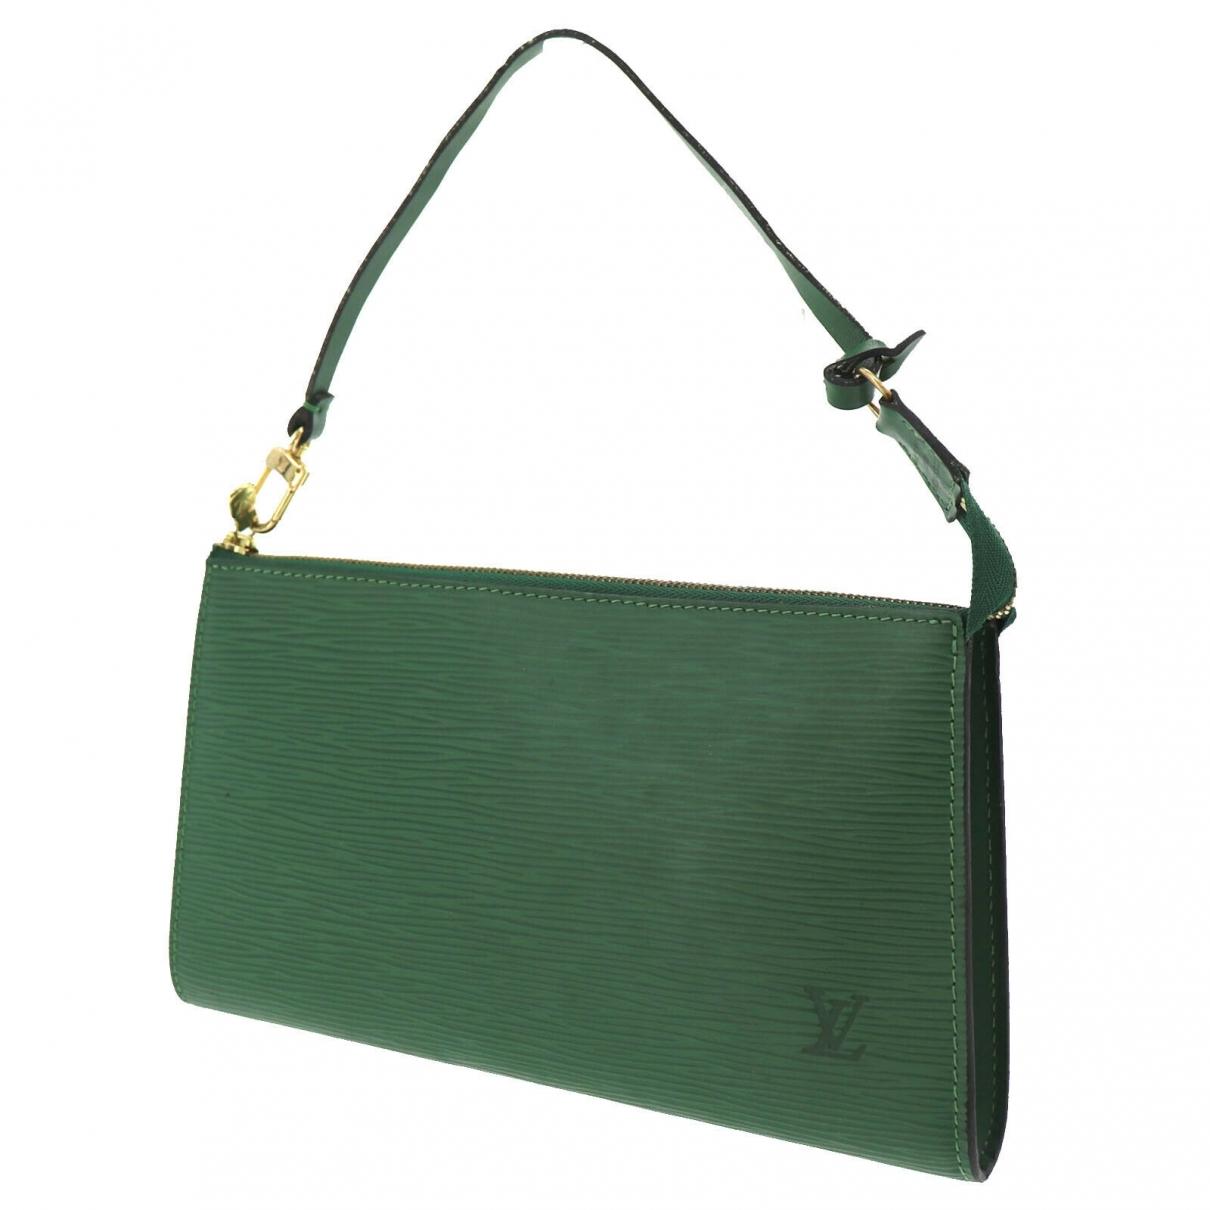 Louis Vuitton Pochette Accessoire Green Leather Clutch bag for Women \N